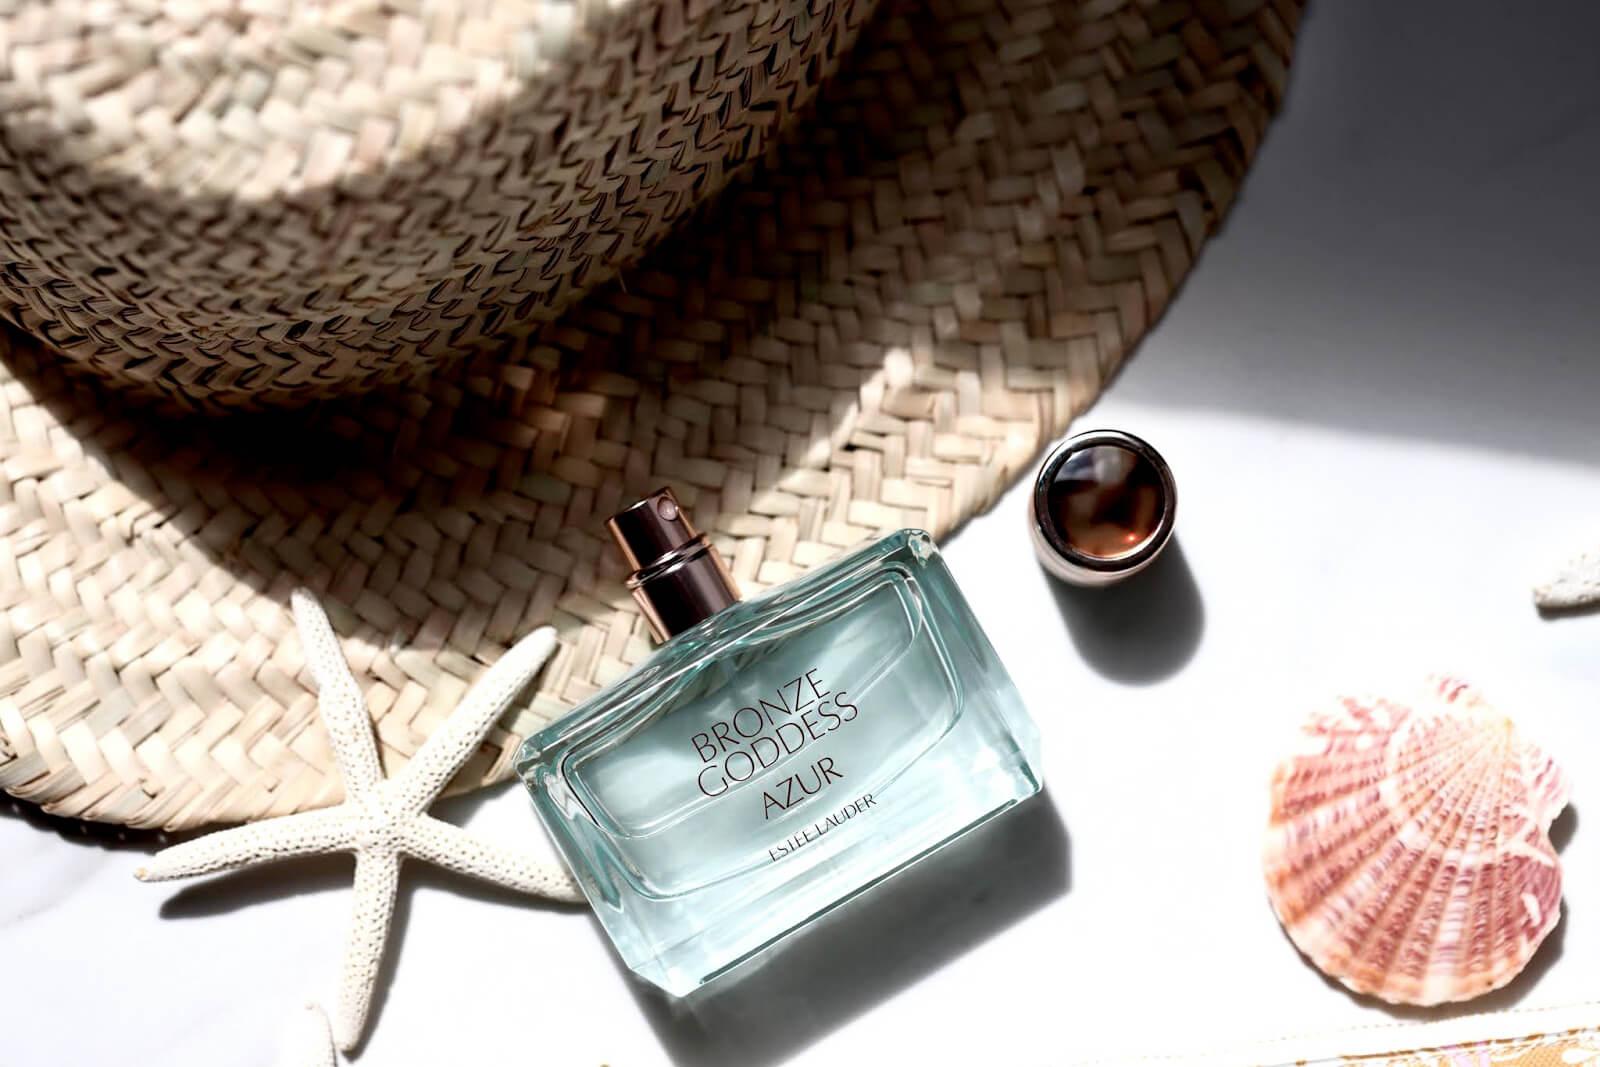 Estee Lauder Bronze Goddess Azur Parfum